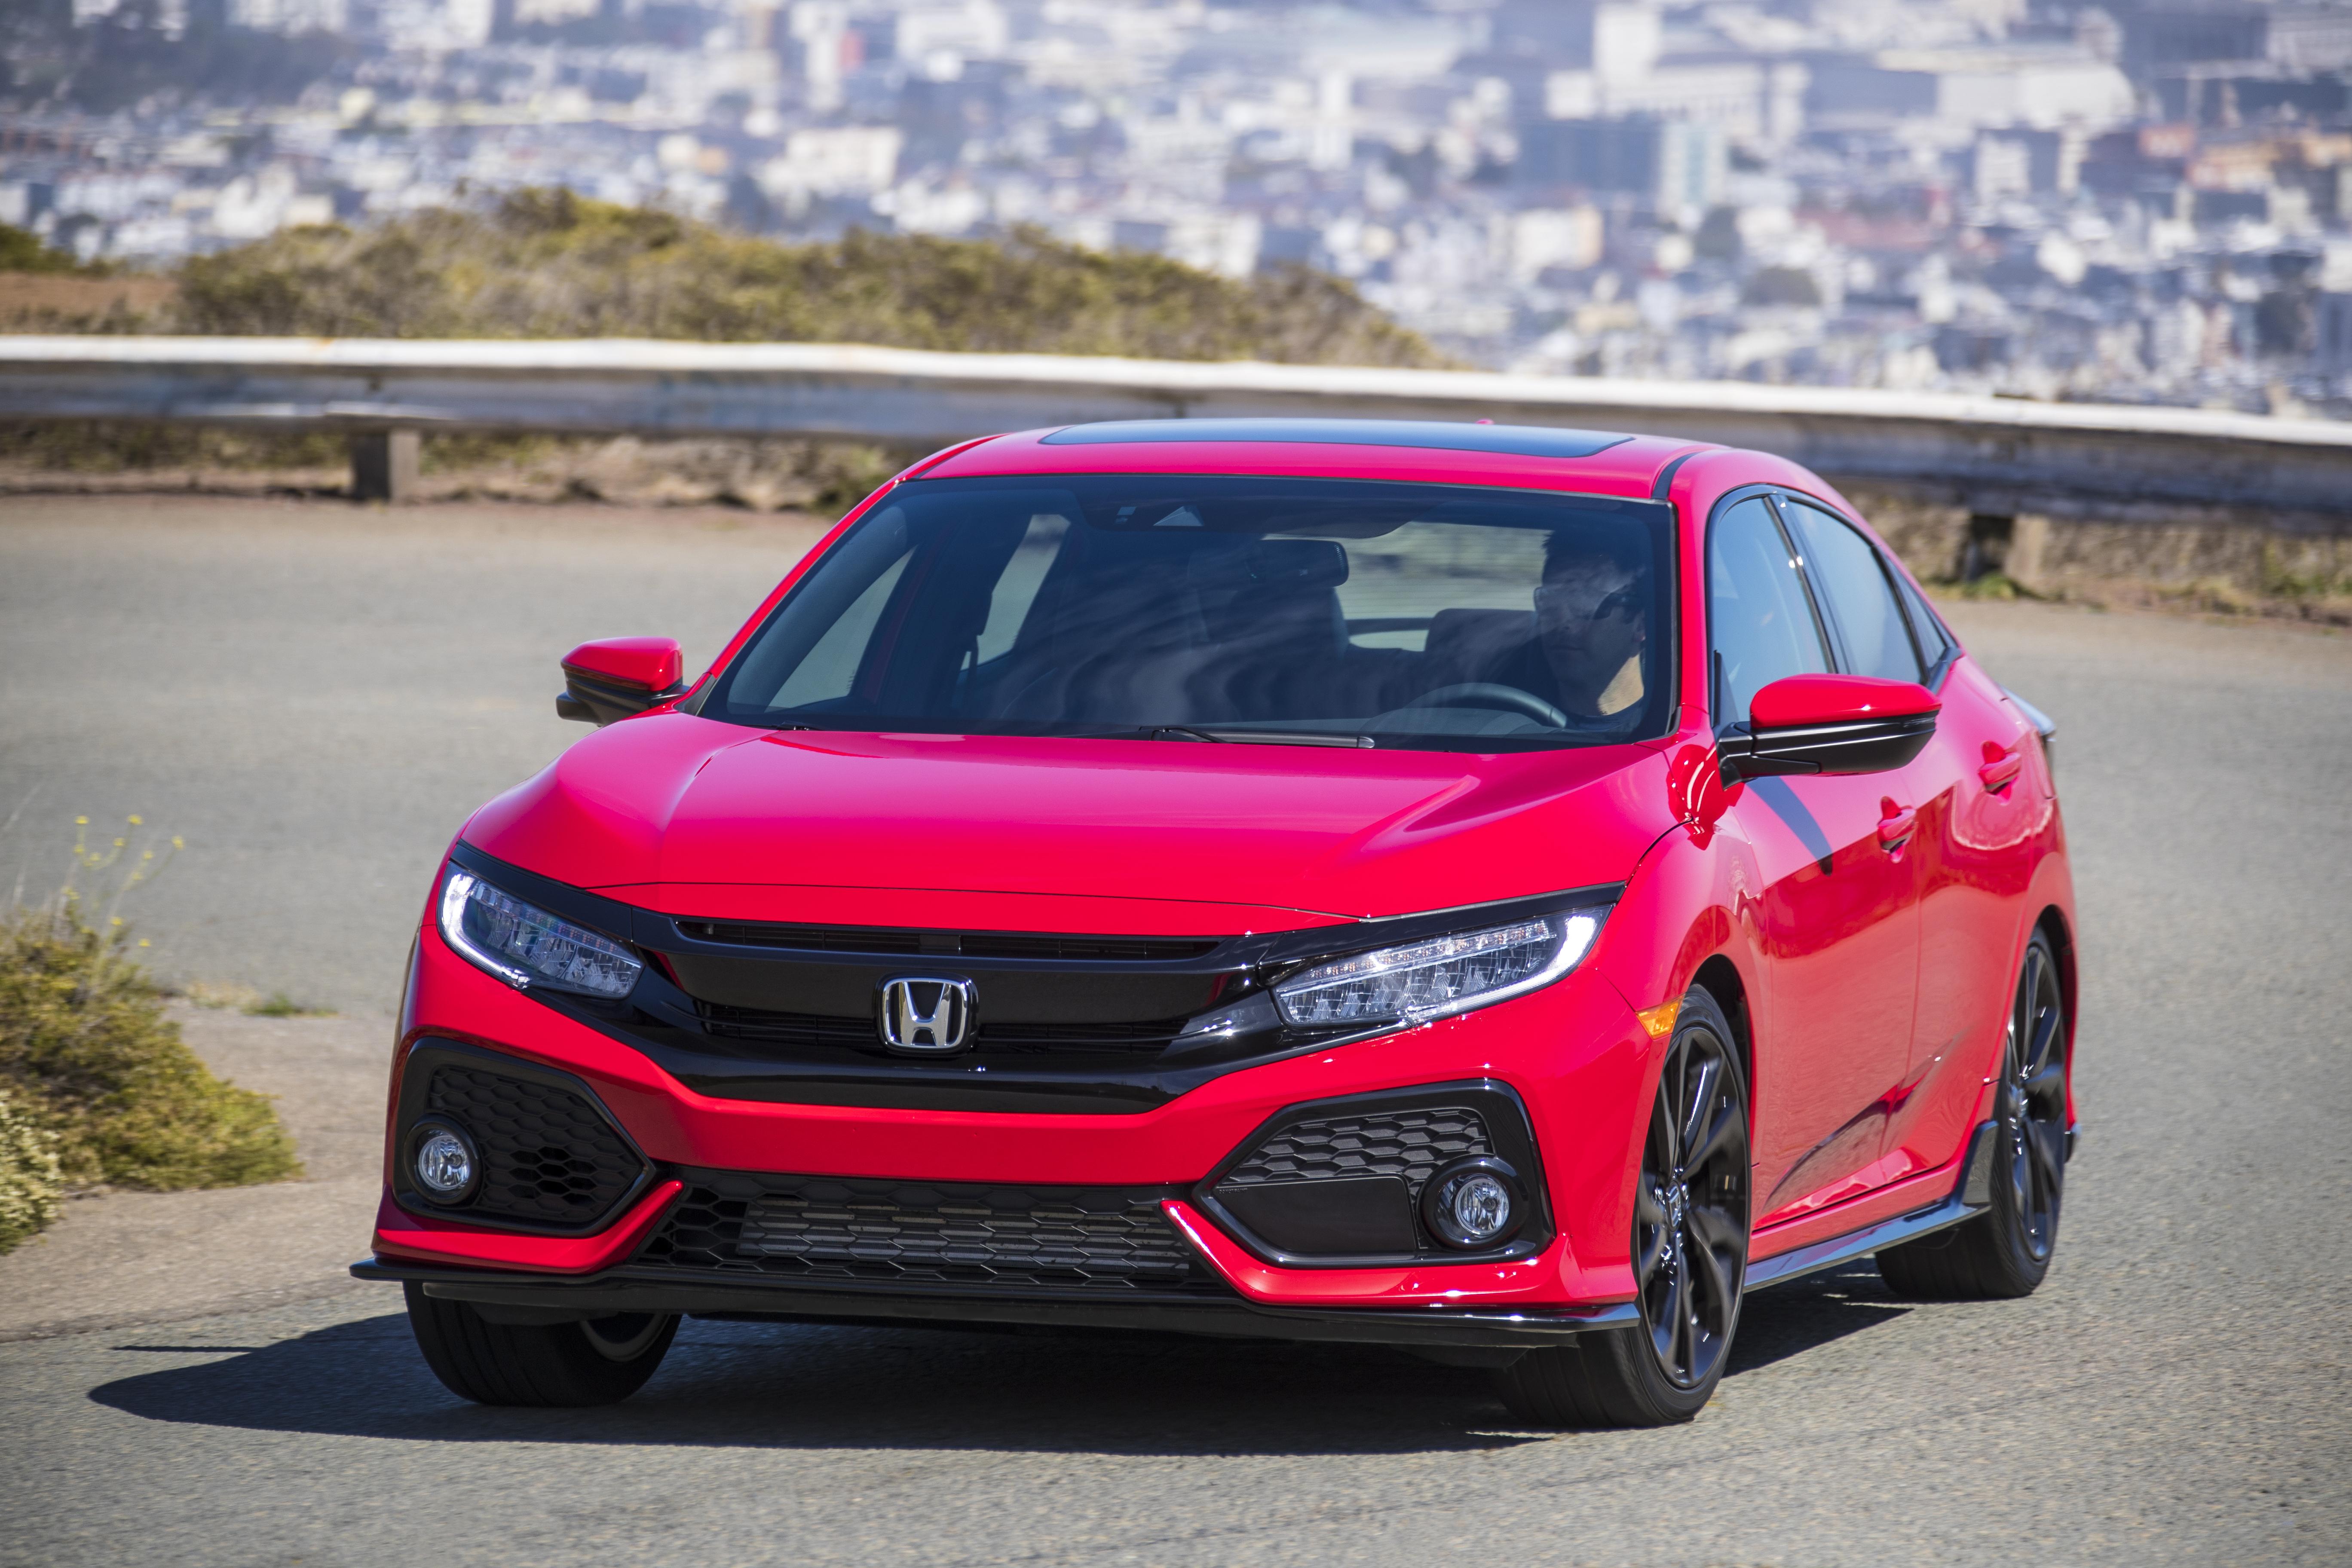 2017 Honda Civic Hatchback: Standard Bearer?